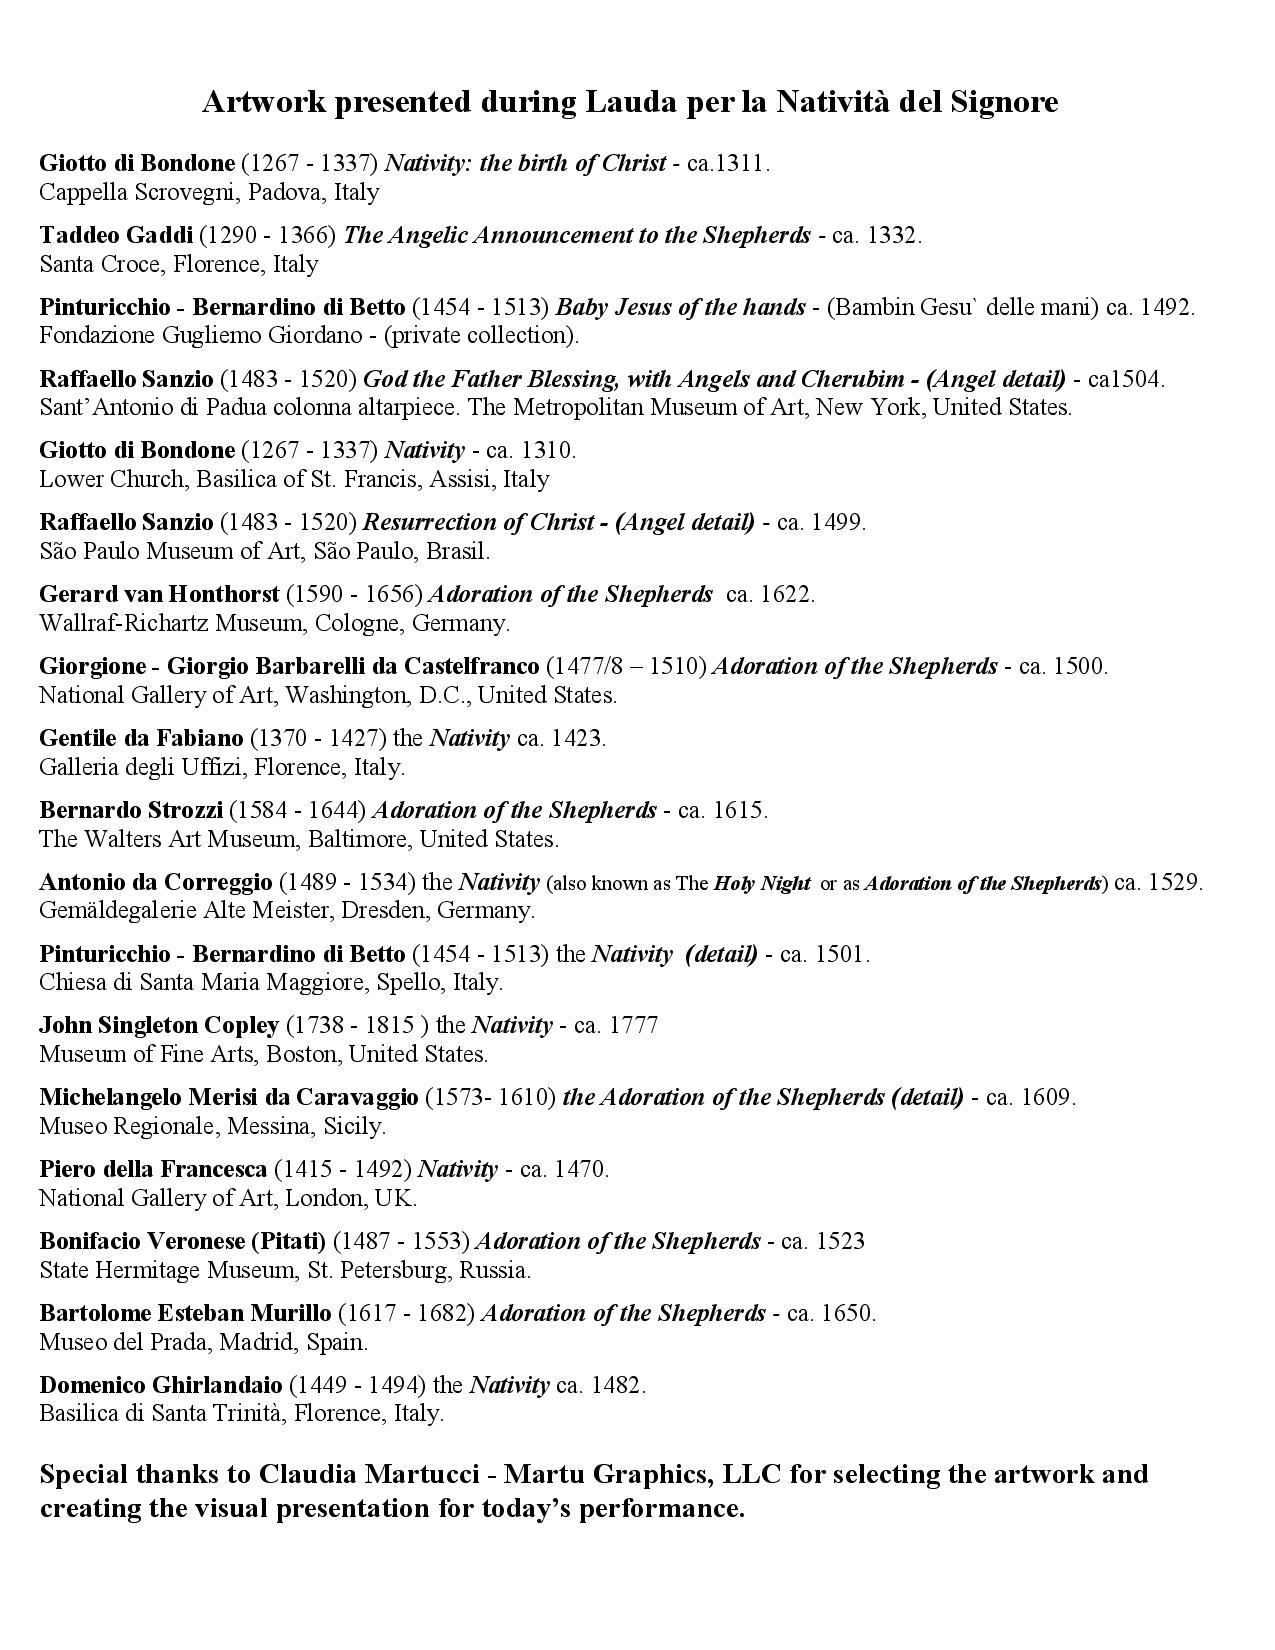 2012-12-16 Program Draft - 2012-12-11 v2-page-006.jpg